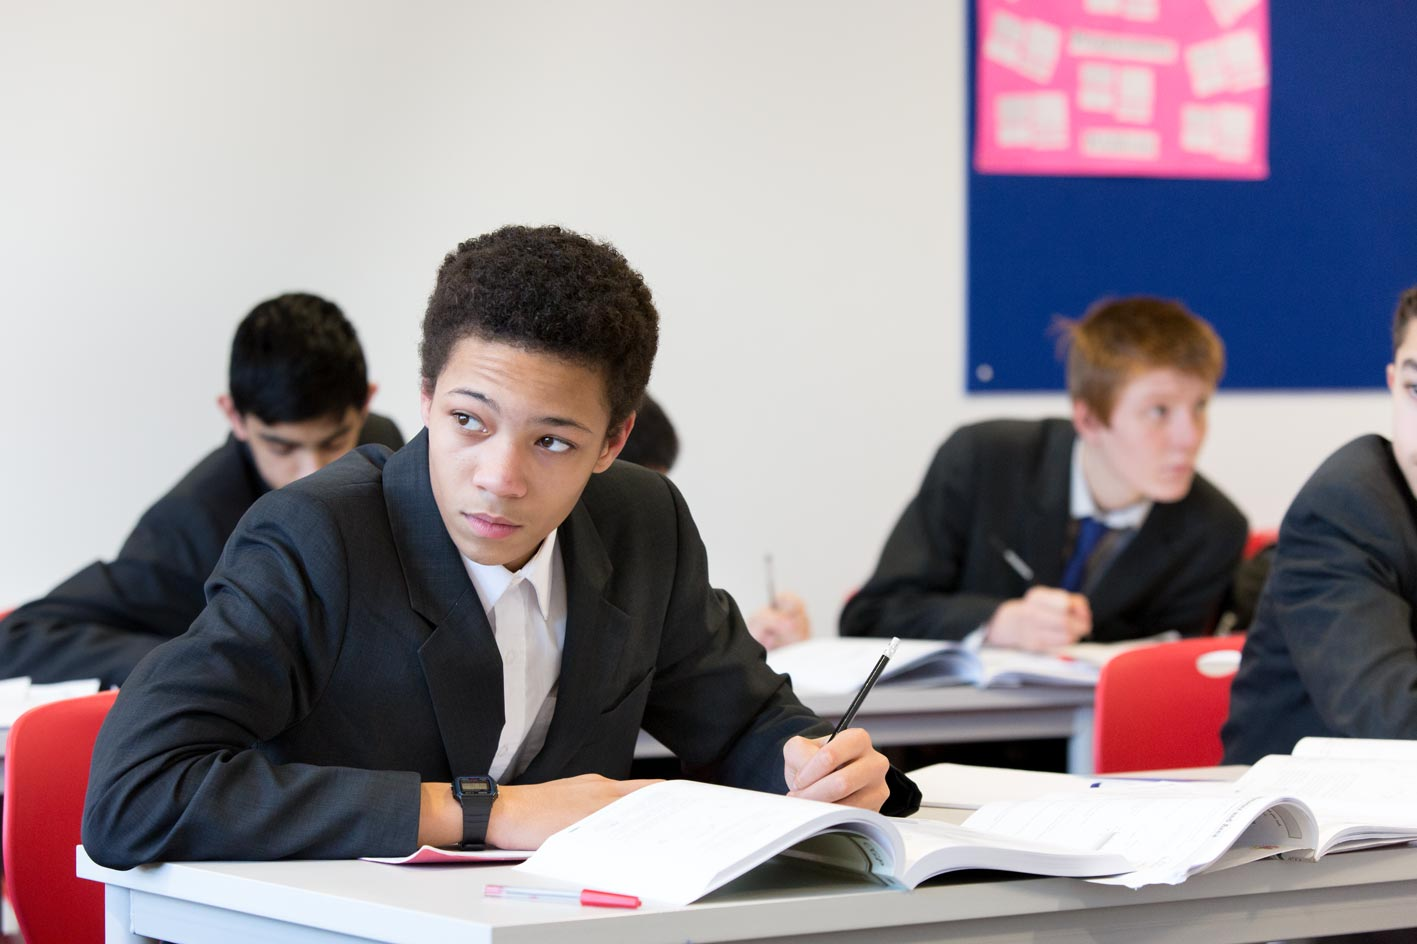 UTC student thinking in classroom